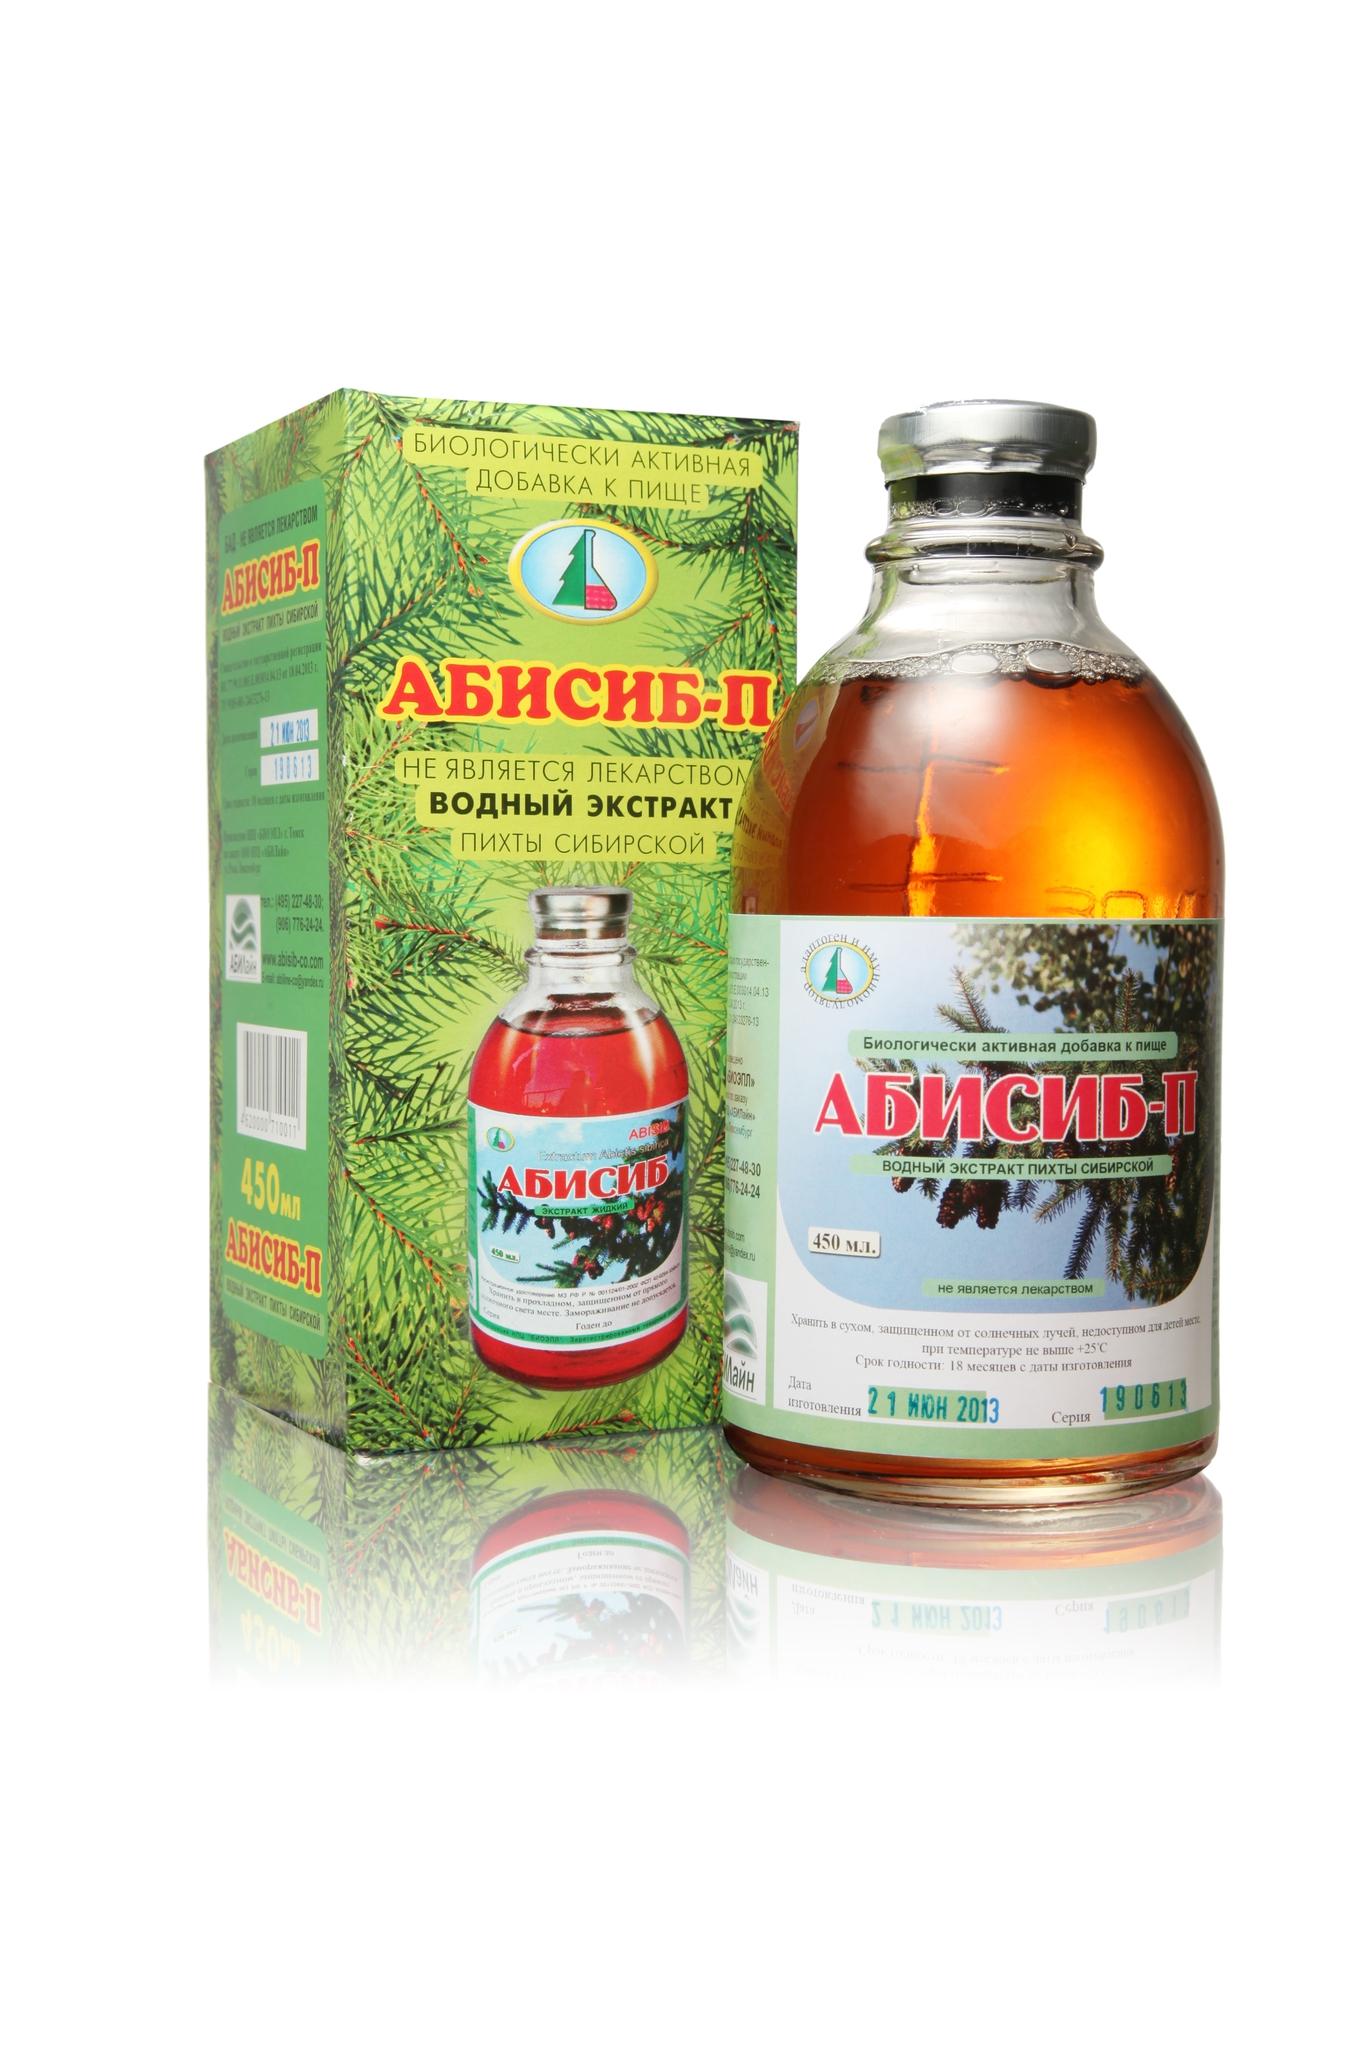 Абисиб-П экстракт пихты сибирской 450 мл.